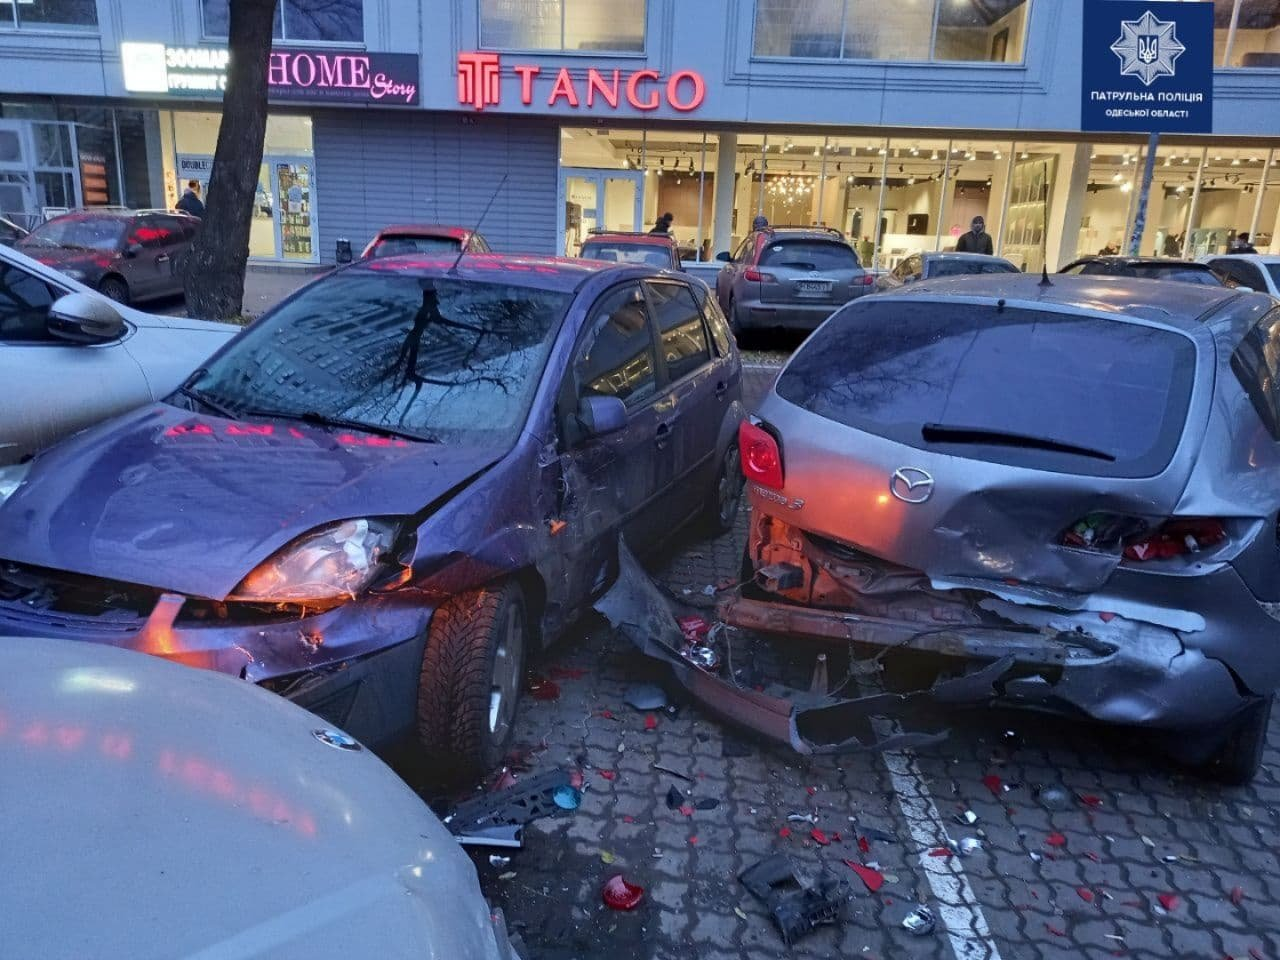 В Одессе автоледи на BMW разбила четыре машины, - ФОТО, ВИДЕО , фото-3